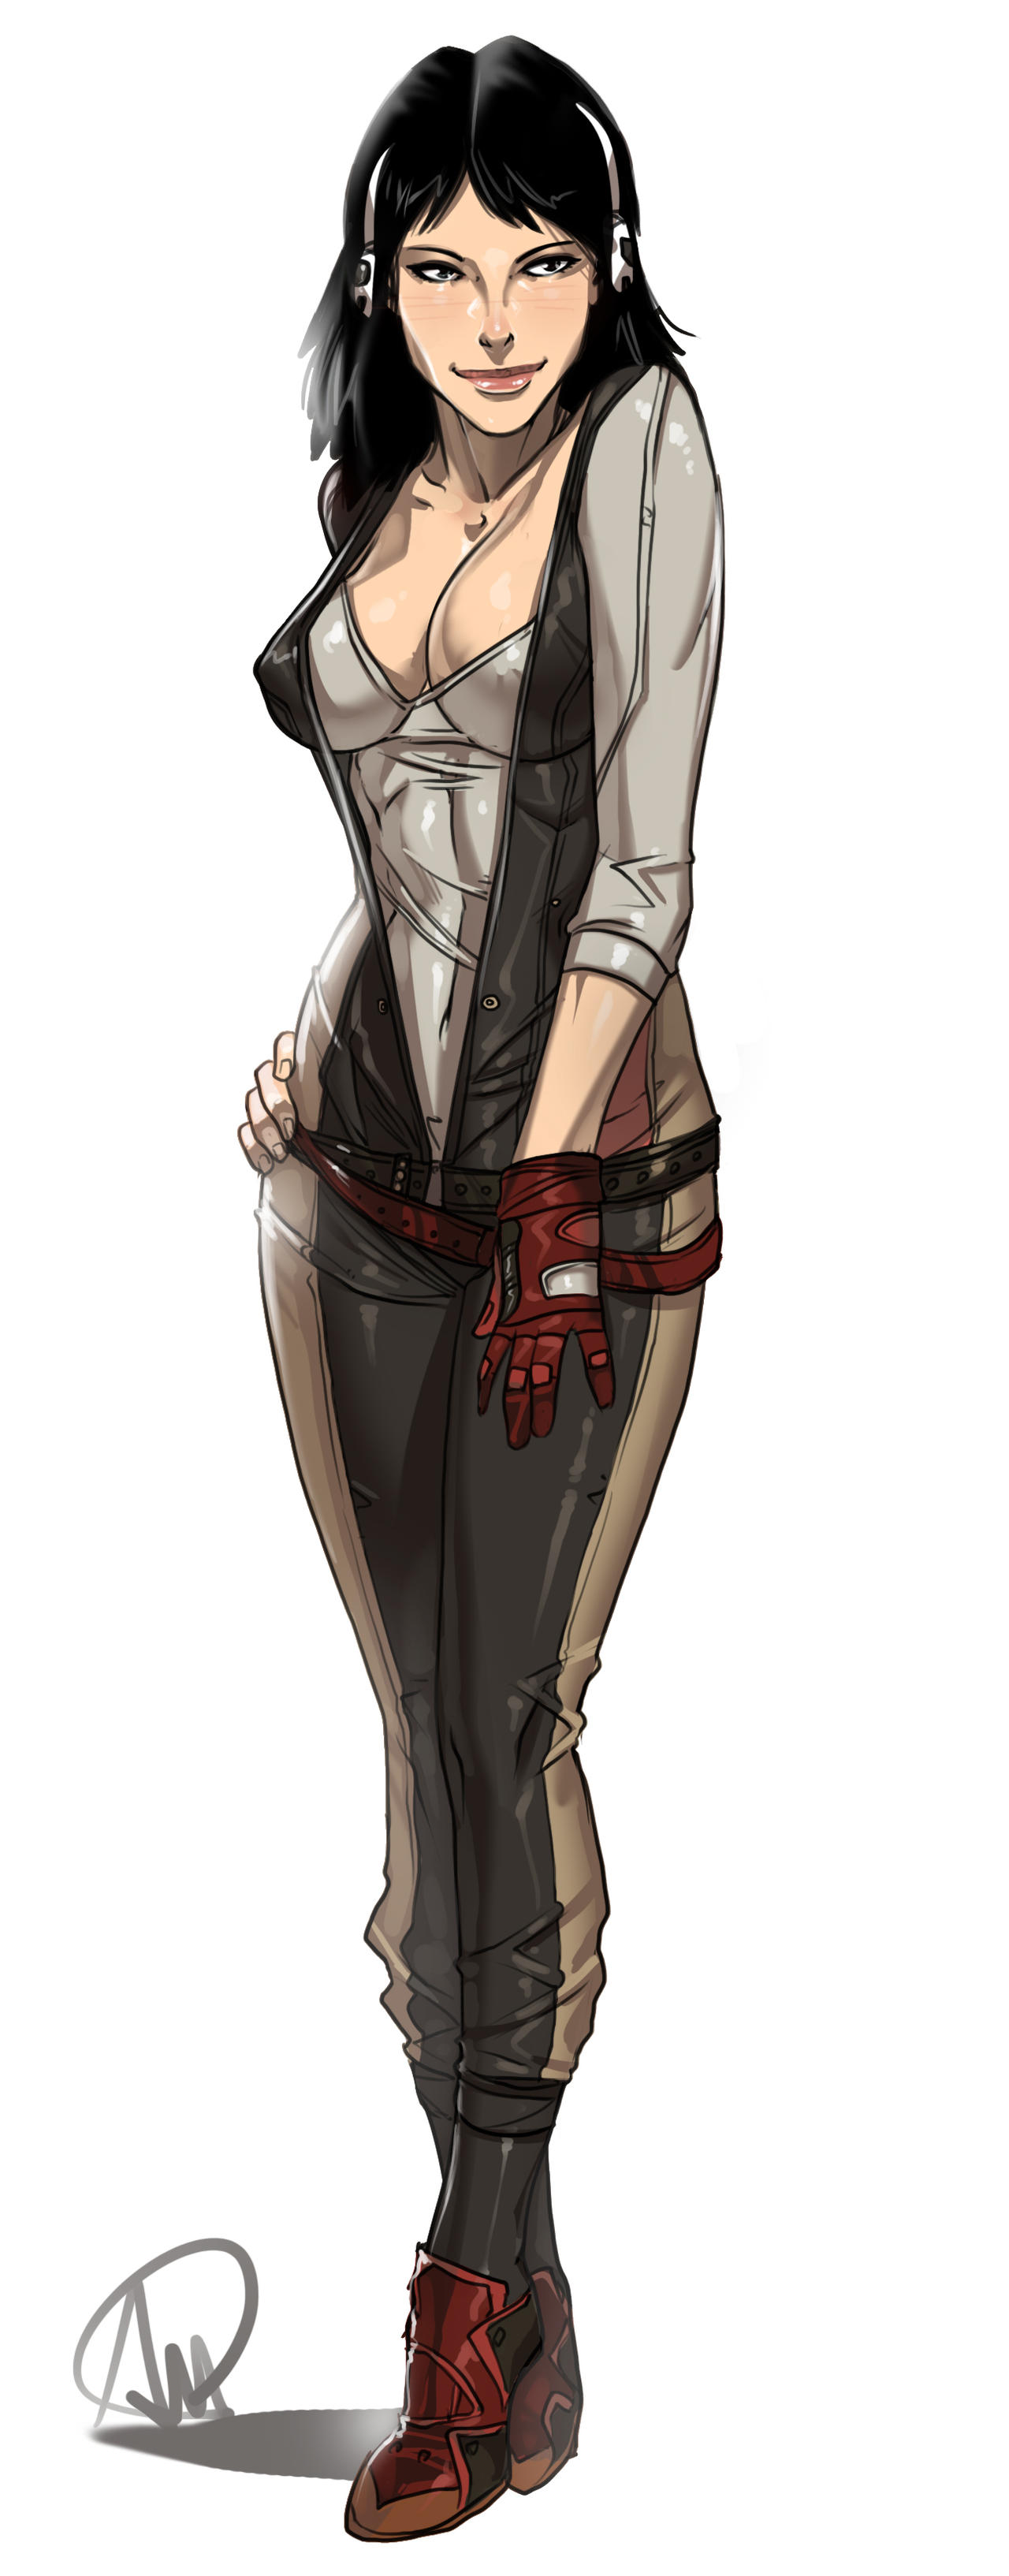 Assassins Creed Rebecca Crane by elcarlo42 on DeviantArt